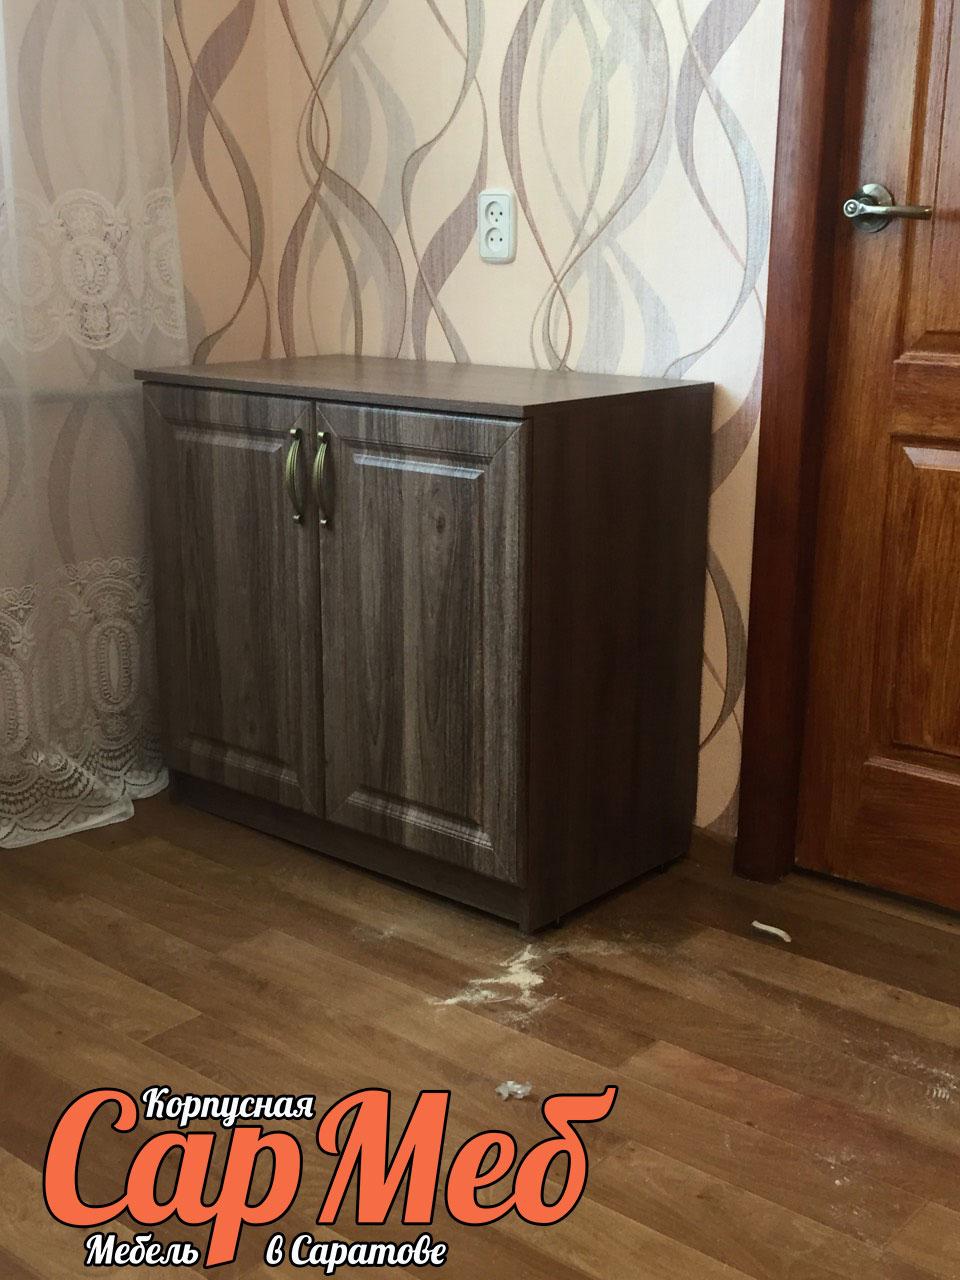 Стенка в гостиную и тумба под телевизор